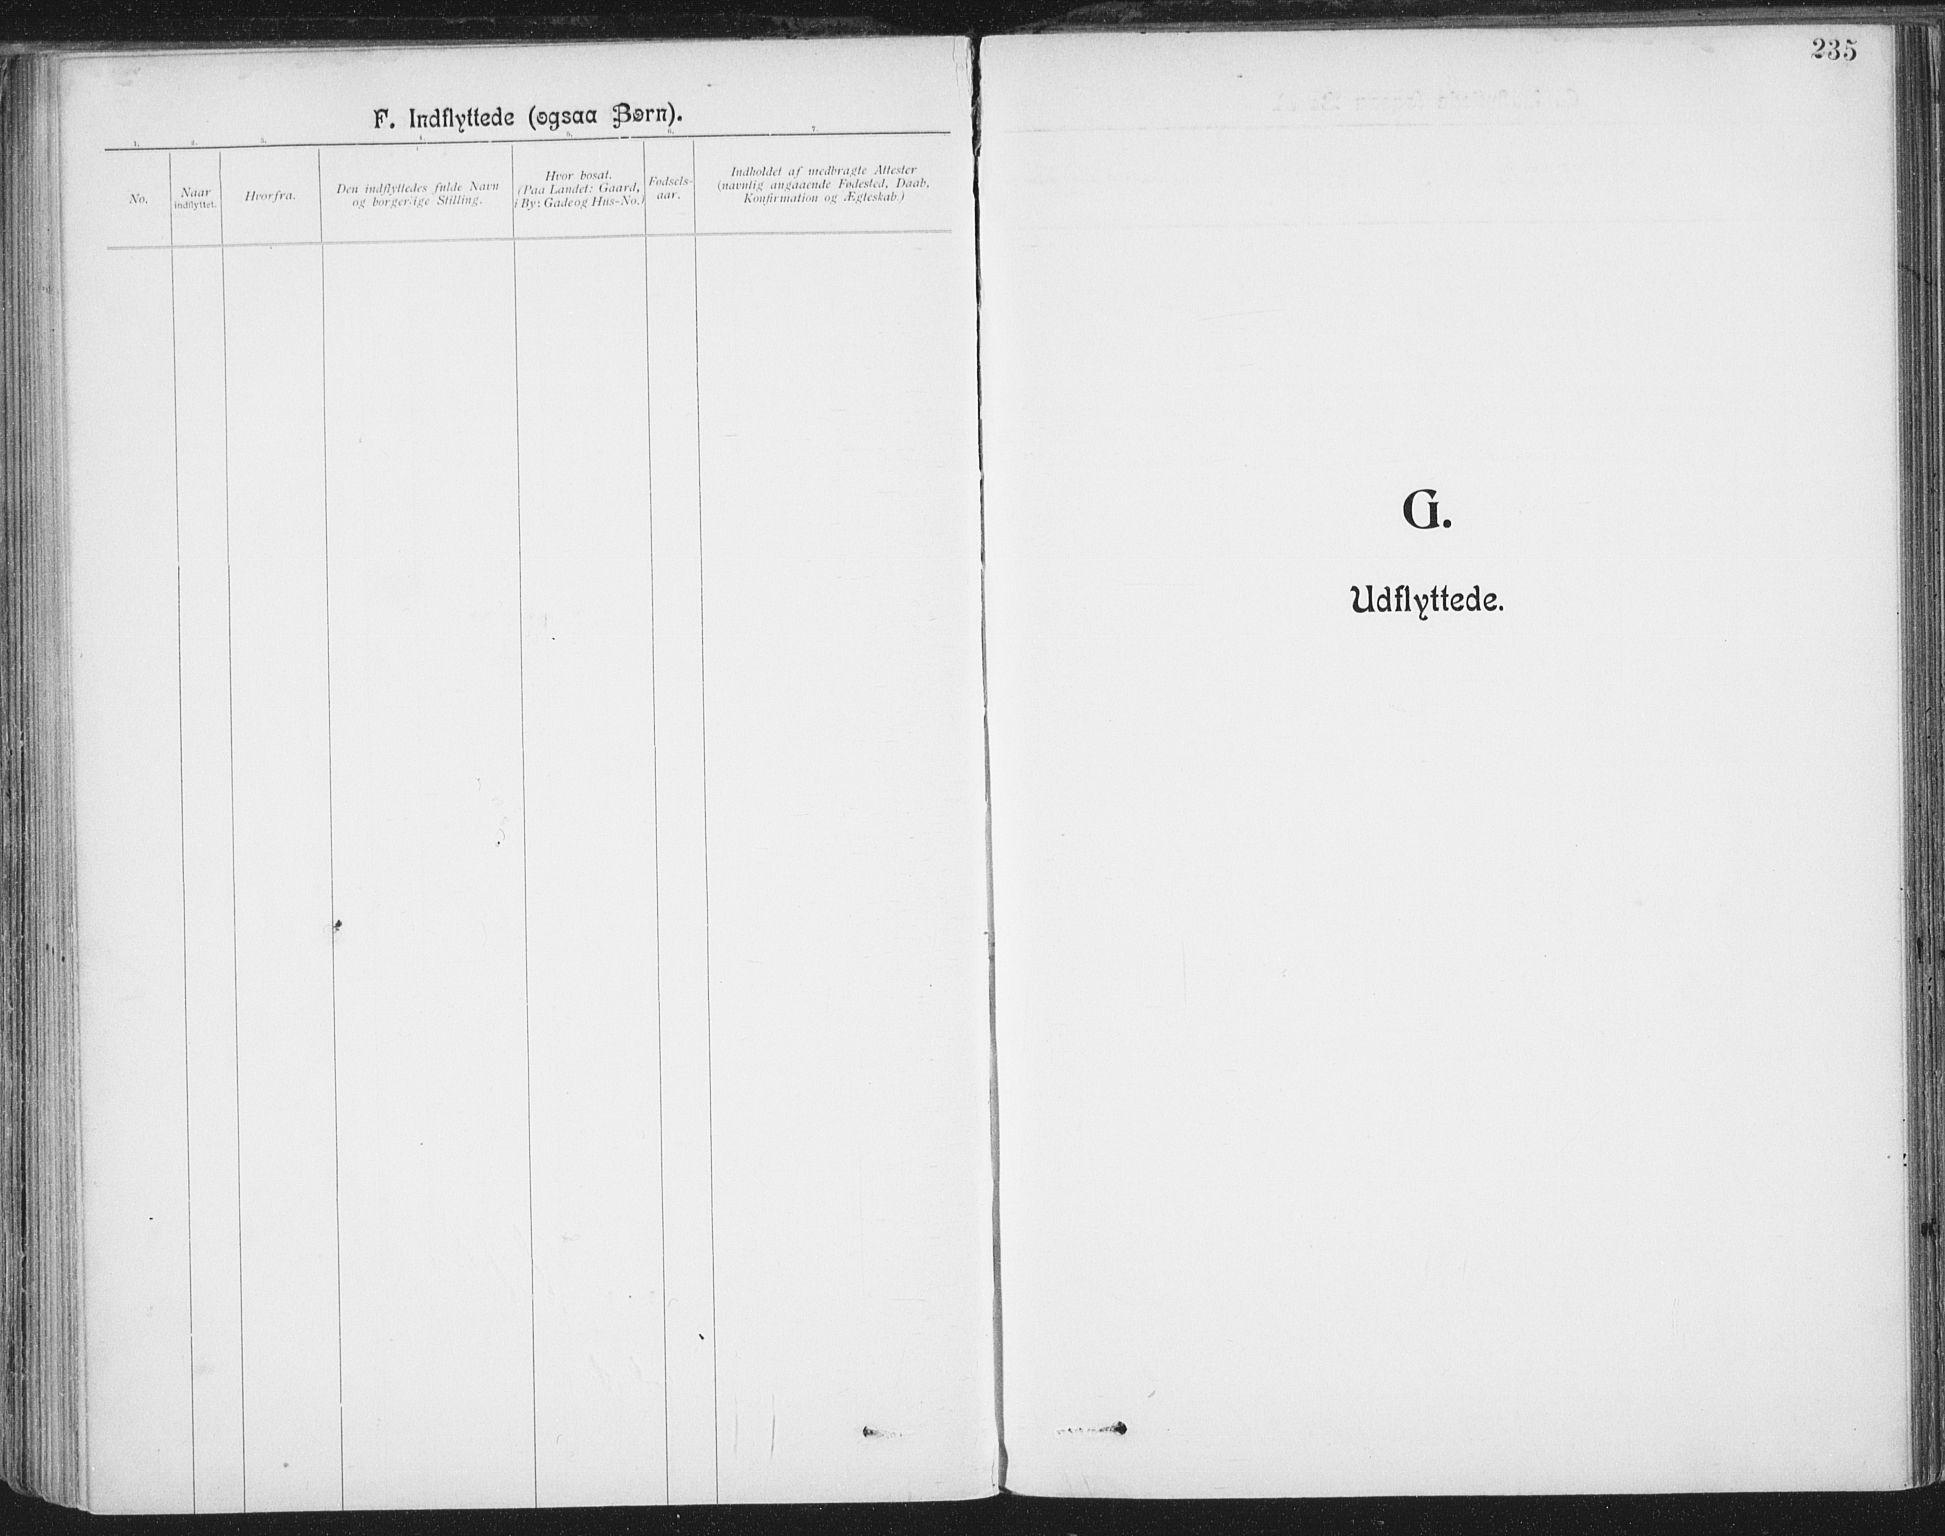 SAT, Ministerialprotokoller, klokkerbøker og fødselsregistre - Nordland, 801/L0012: Ministerialbok nr. 801A12, 1900-1916, s. 235